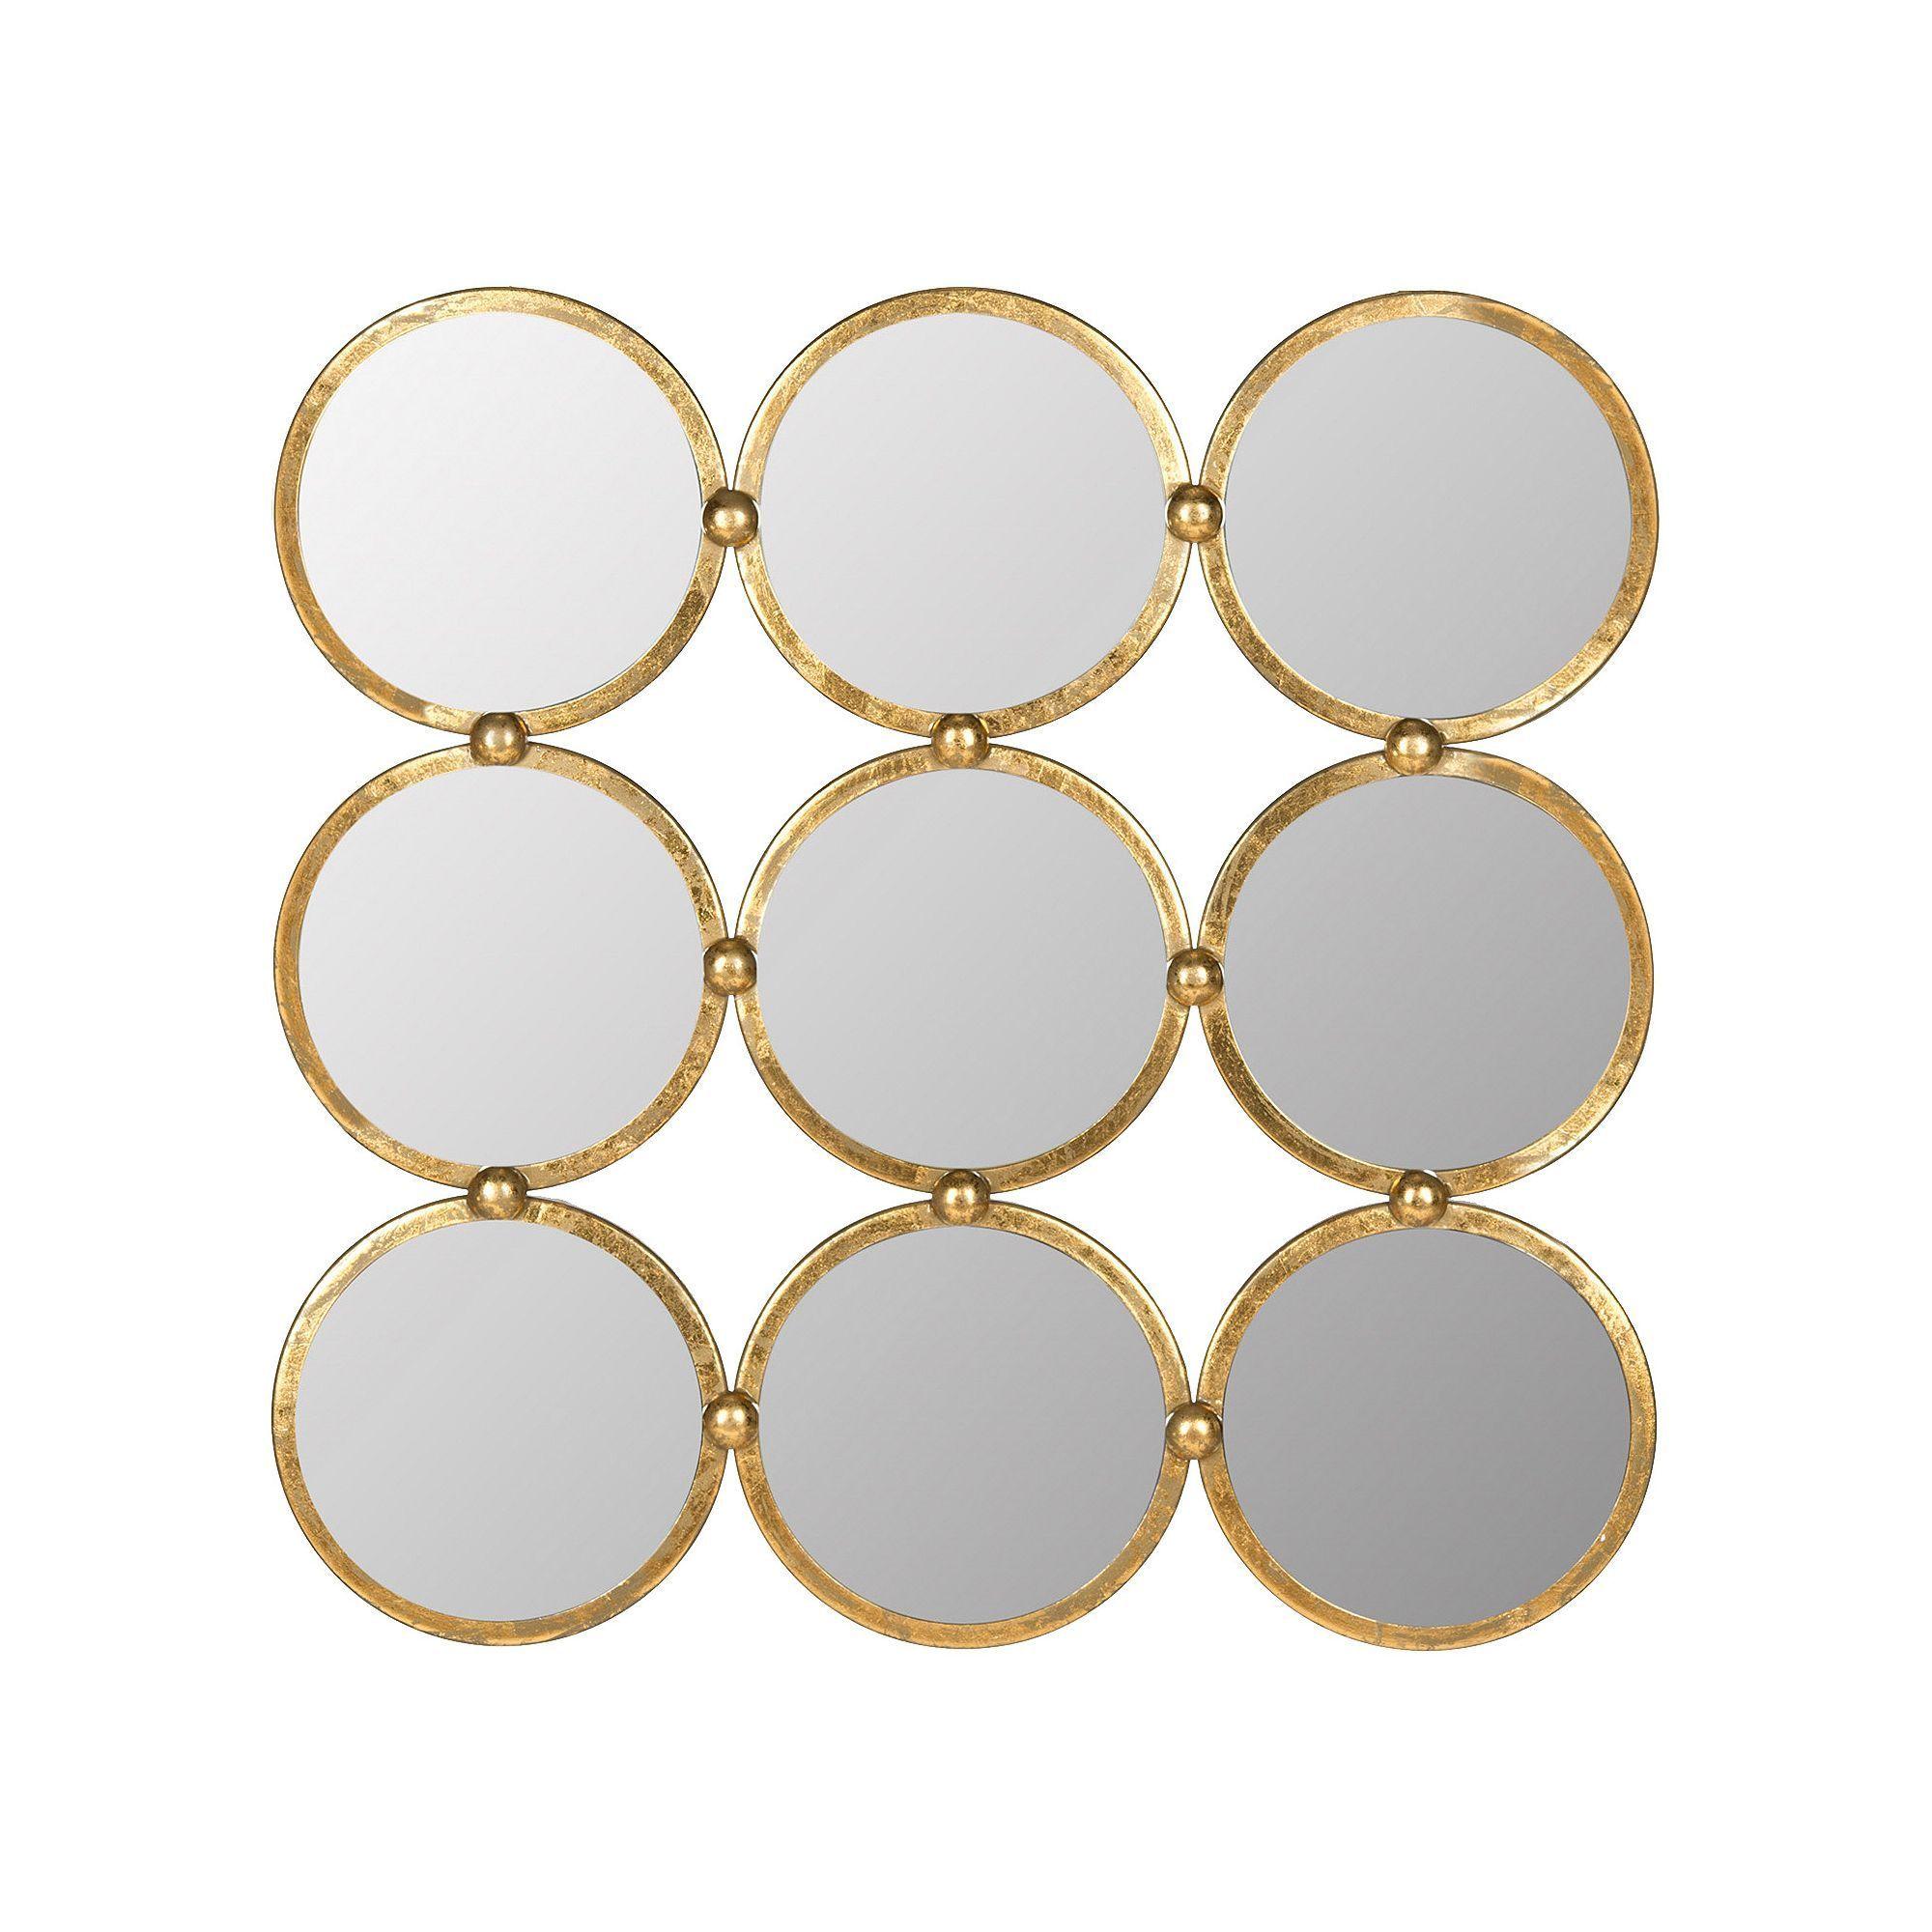 Safavieh Circles In Square Wall Mirror Mirror Circular Mirror